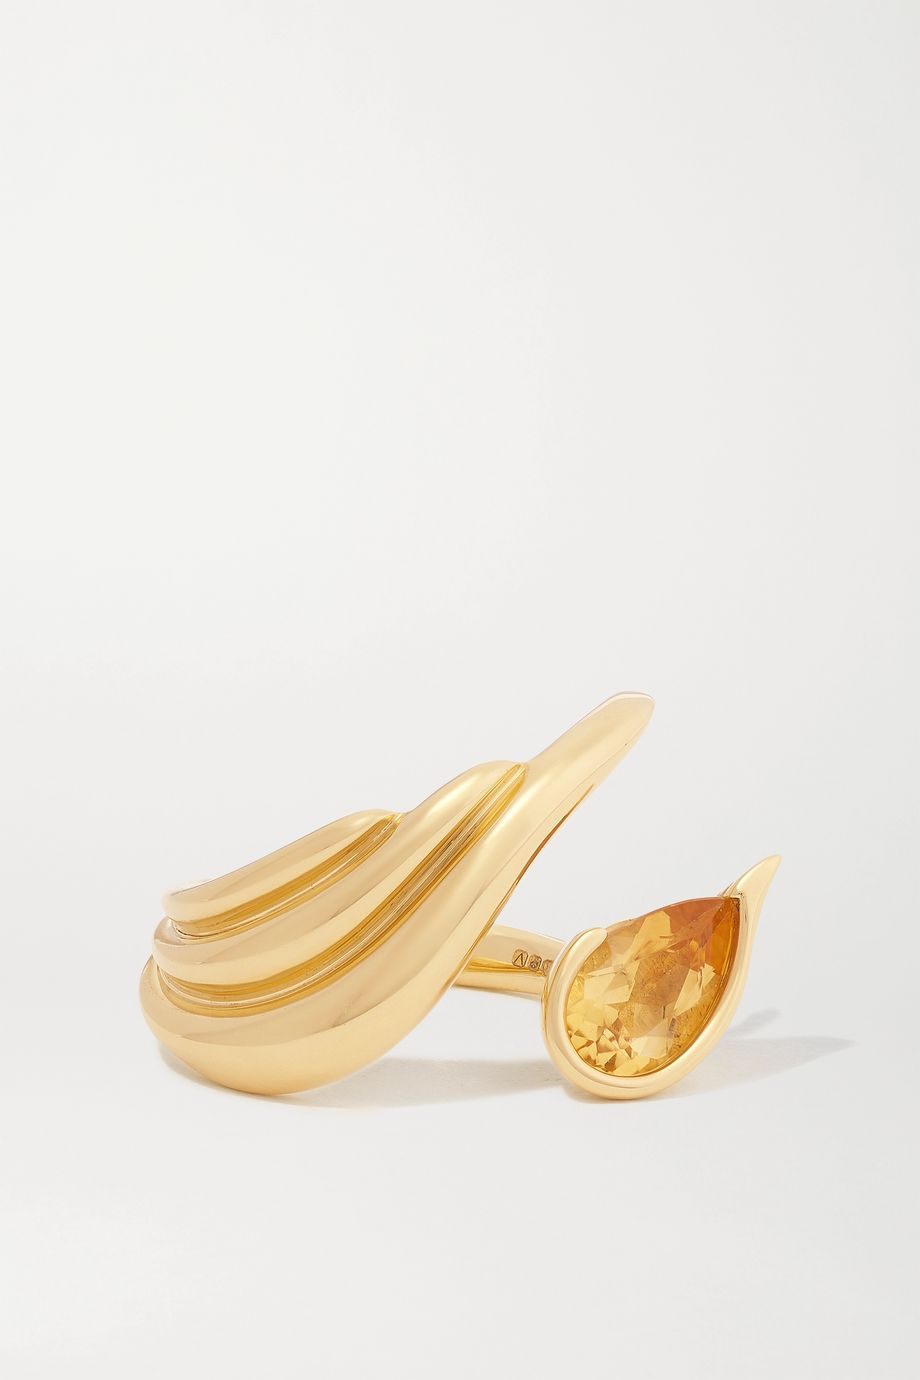 Fernando Jorge Kindle Ring aus 18 Karat Gold mit Citrin